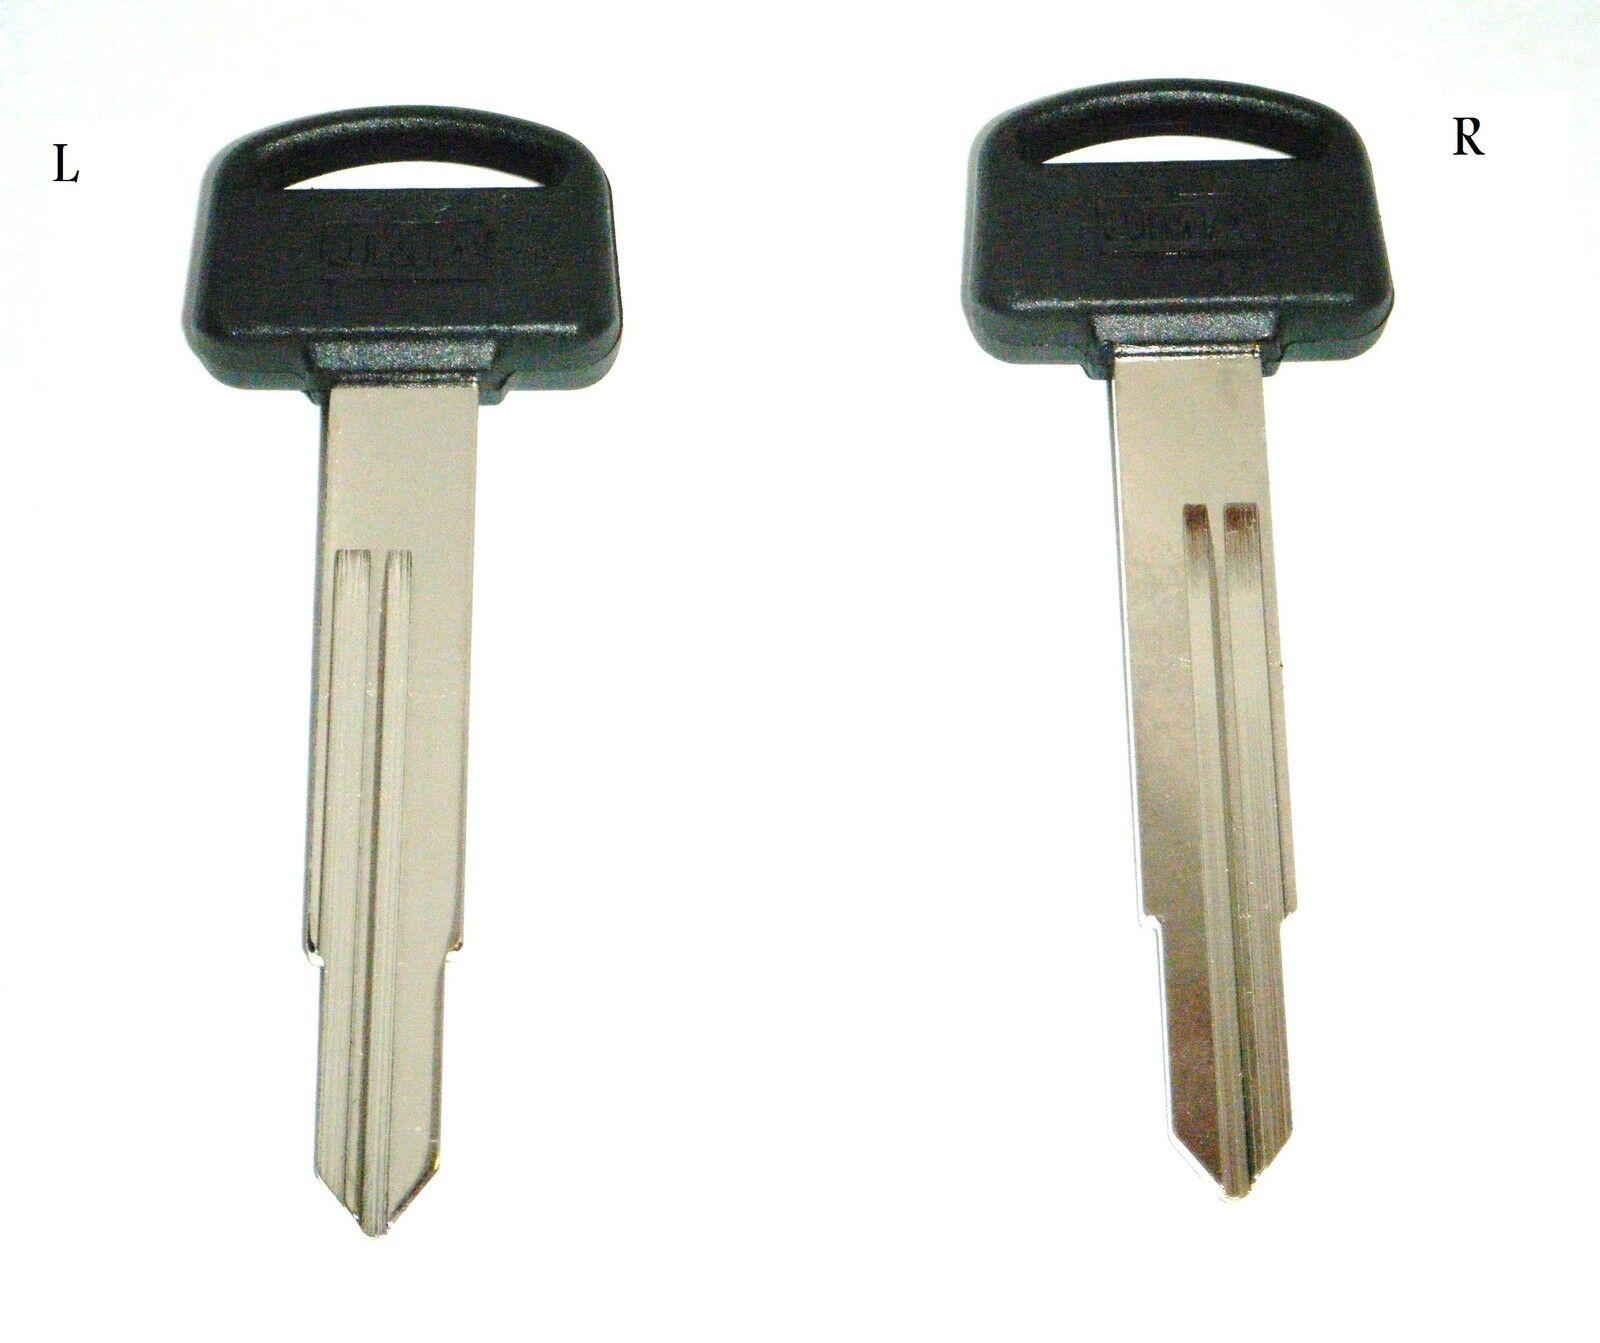 Honda Metropolitan Key Blank 2002 2003 2004 2005 2006 Metropolitan Scooter Keys